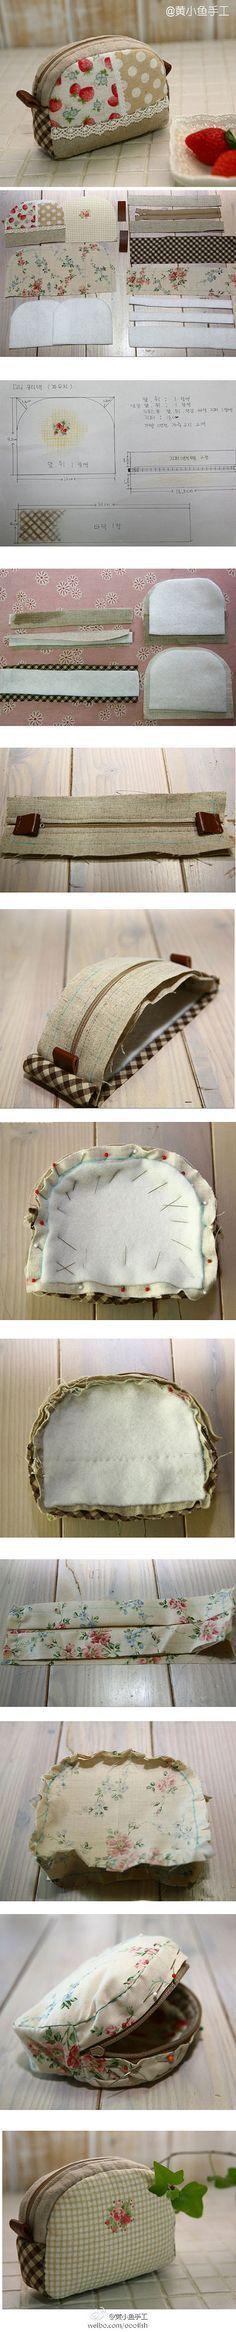 Pouch tutorial, sewing tutorial, makeup bag, sewing bag and lunch bag Sewing Tutorials, Sewing Hacks, Sewing Patterns, Tutorial Sewing, Purse Patterns, Fabric Crafts, Sewing Crafts, Sewing Projects, Pouch Tutorial